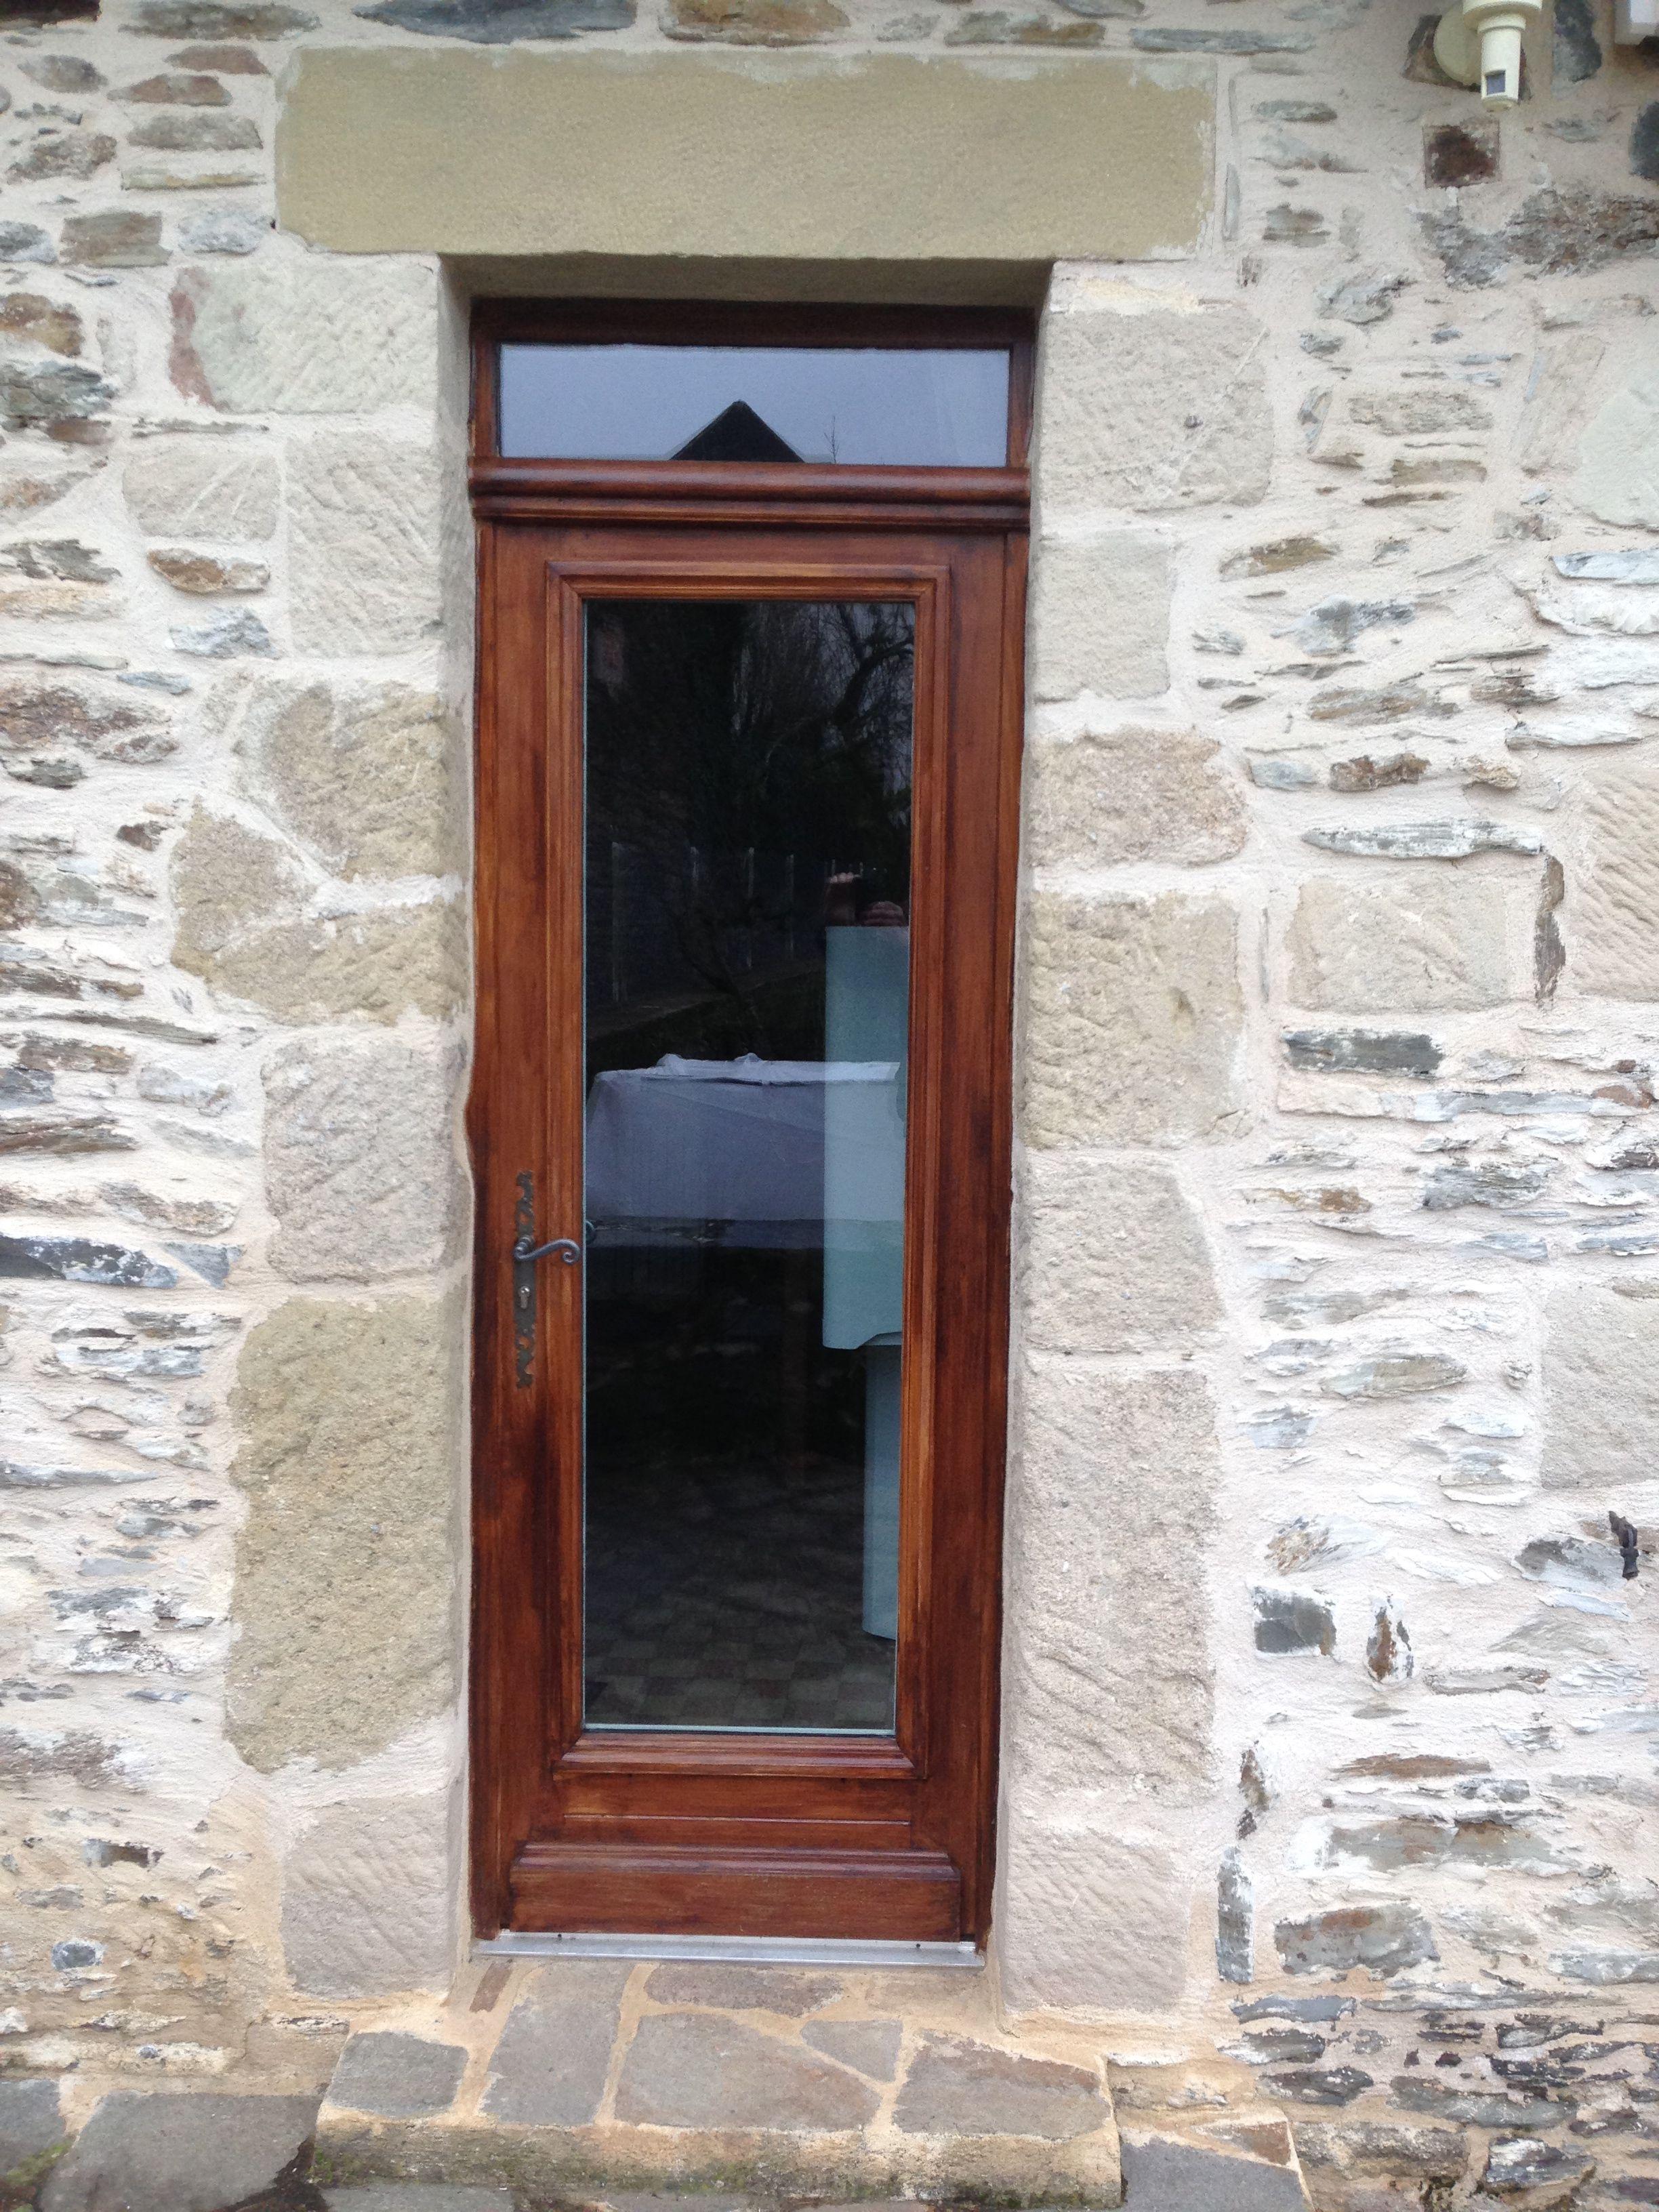 porte d 39 entr e 1 vantail enti rement vitr e avec moulure imposte vitr e portes d 39 entree. Black Bedroom Furniture Sets. Home Design Ideas